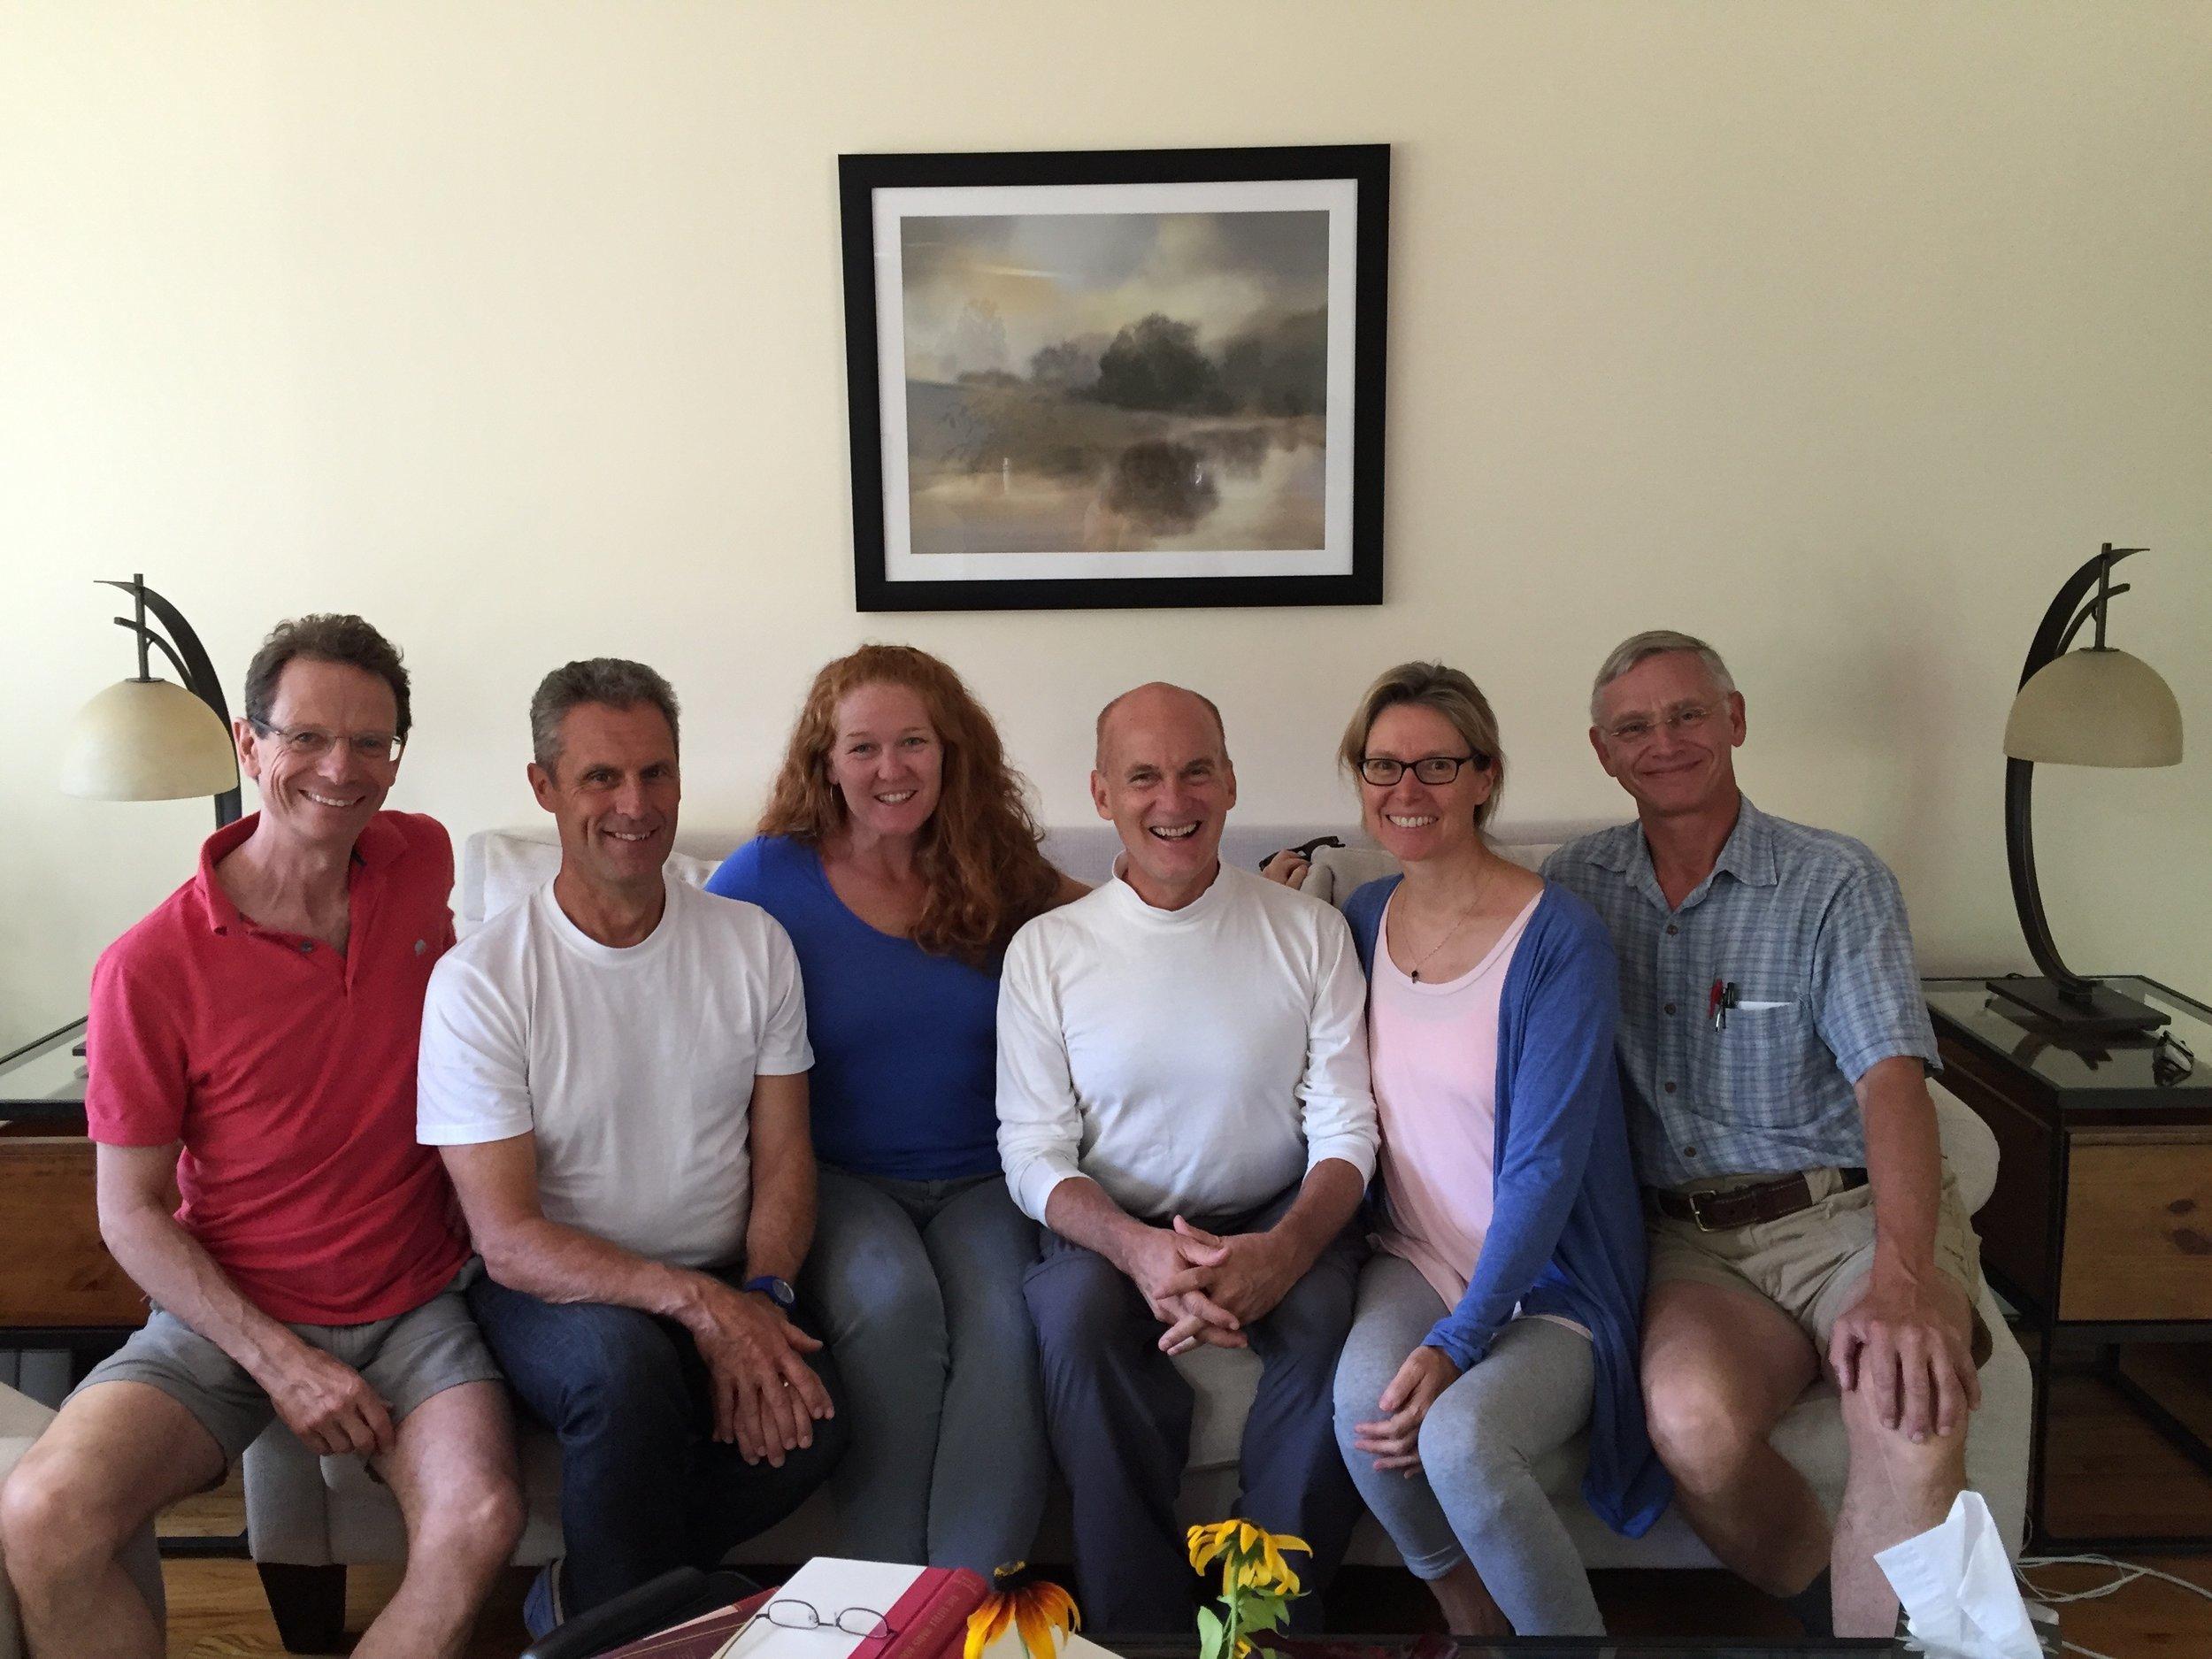 From L-R: Michael Lansky, Michael Neu, Katie Moran, Jaimen McMillan, Dorothea McMillan, and John Takacs.  Mechanicville, NY, July 2016.